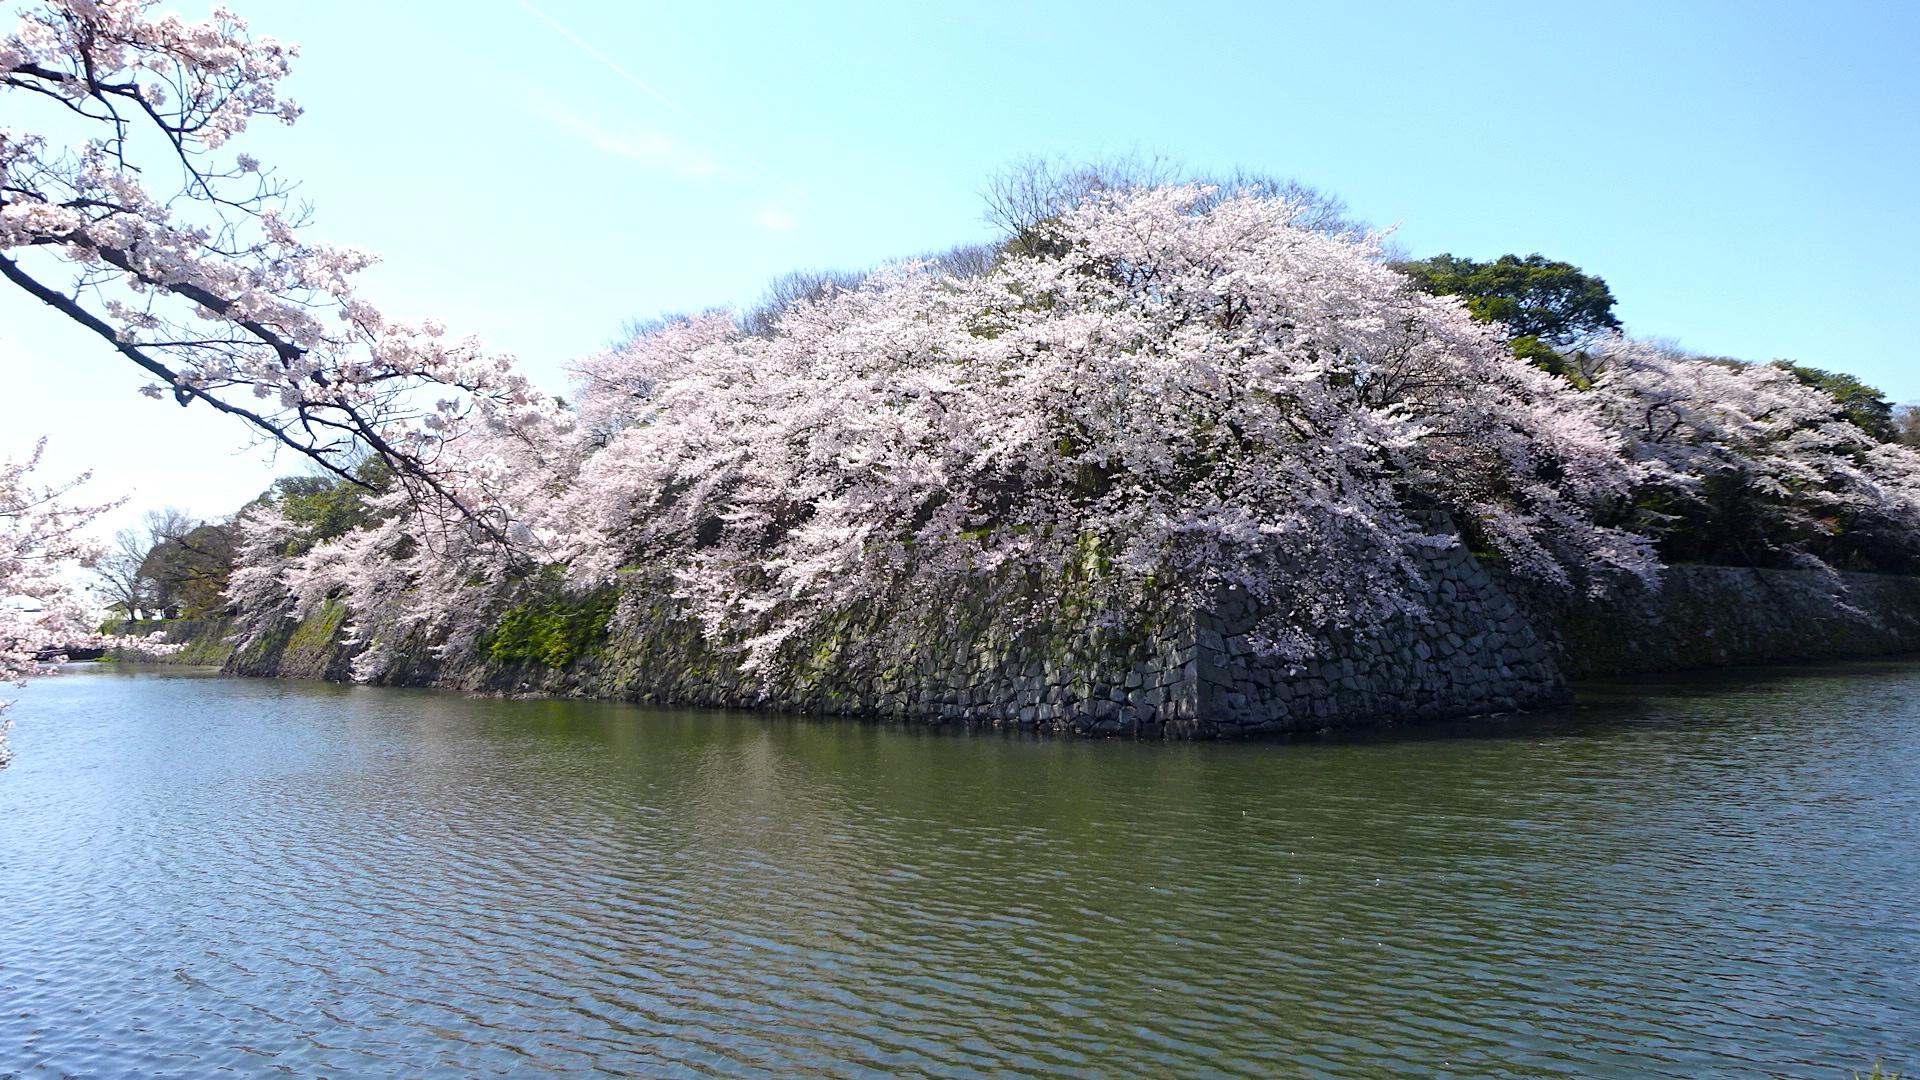 https://cdn-ak.f.st-hatena.com/images/fotolife/s/shioshiohida/20190409/20190409123350_original.jpg